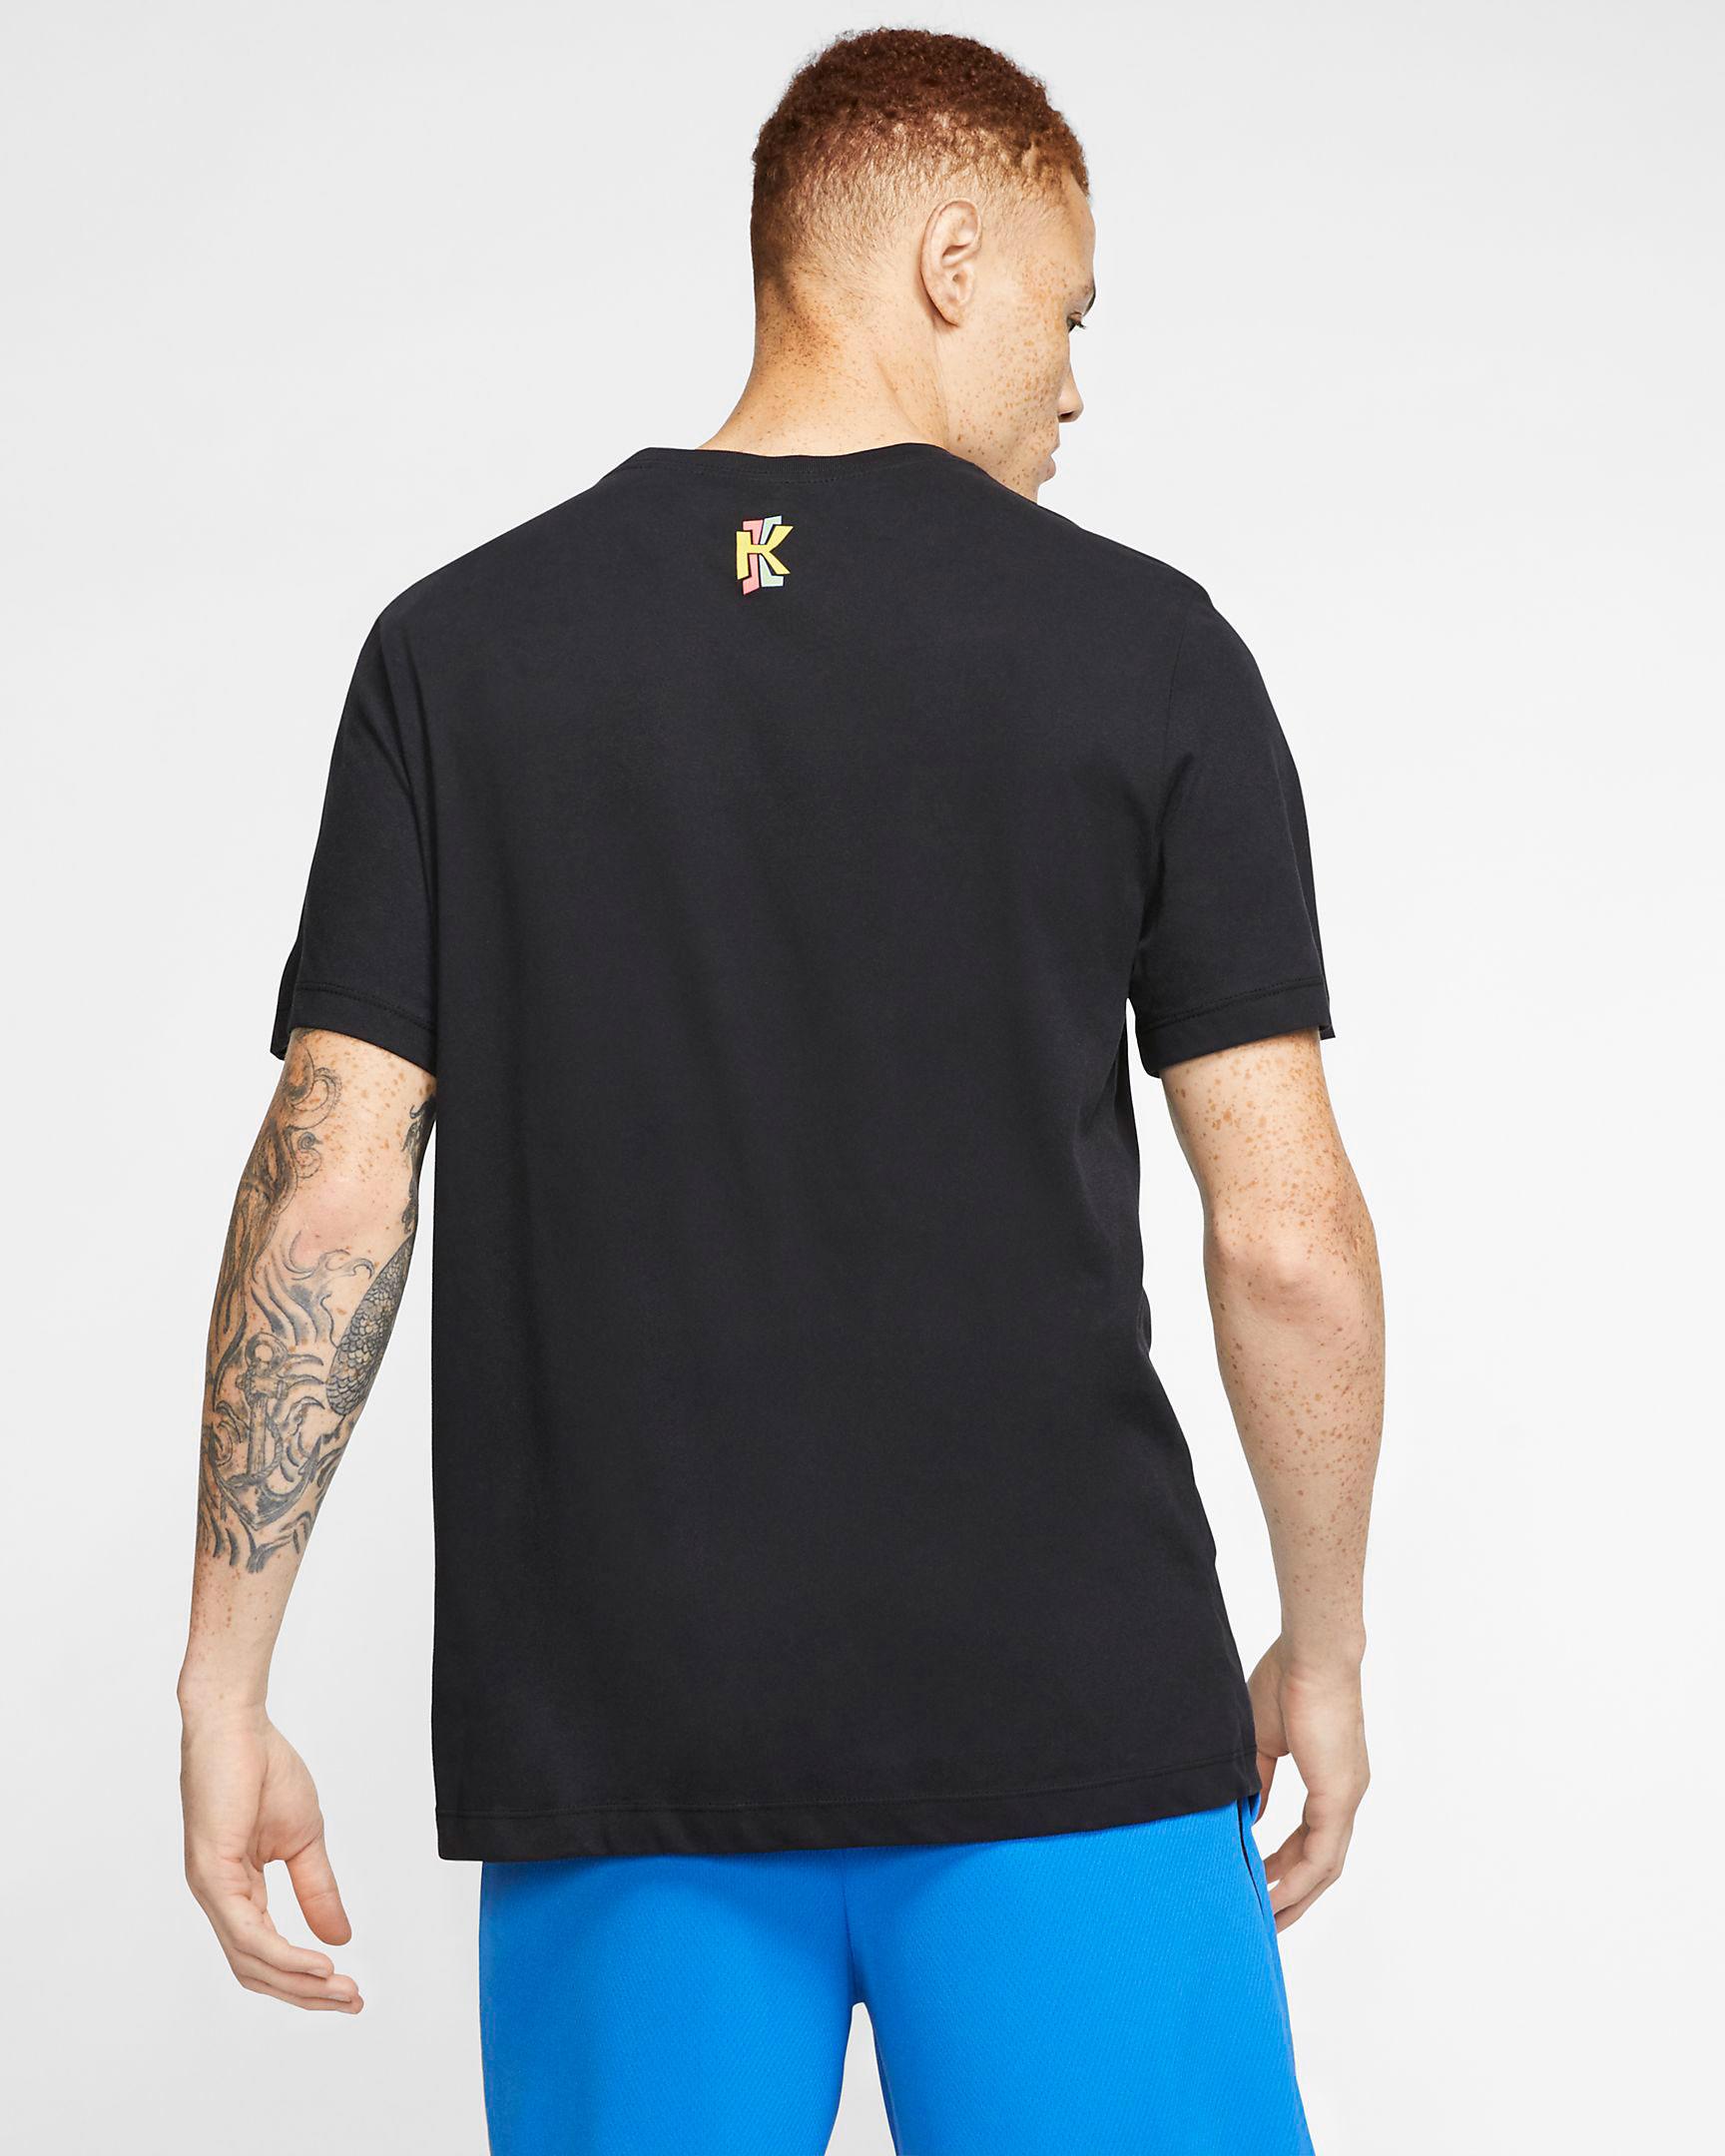 spongebob-nike-kyrie-pineapple-house-shirt-2